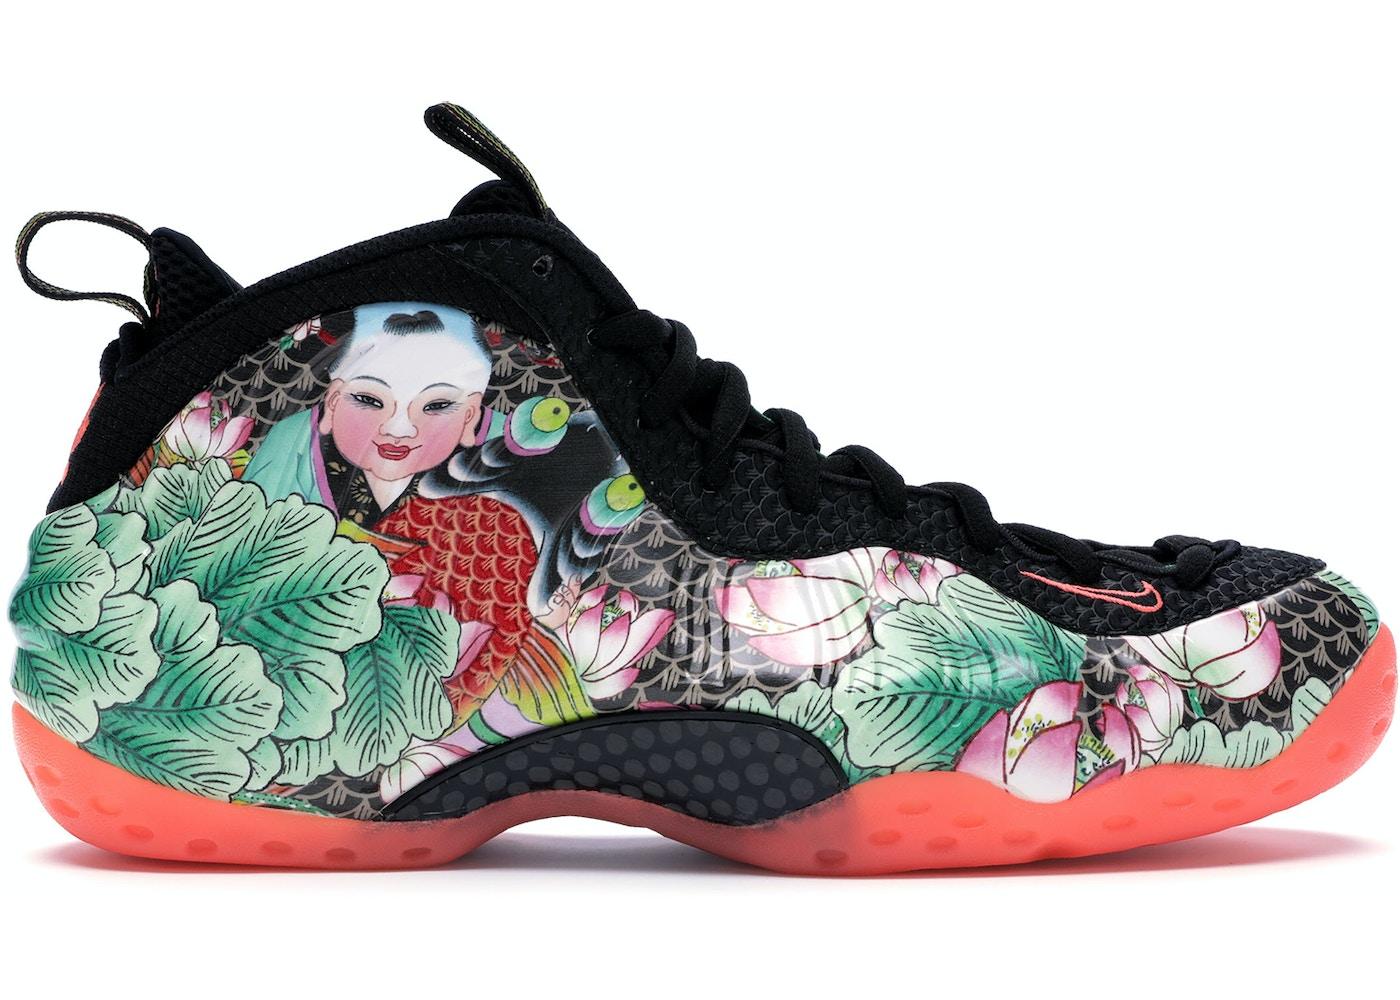 sports shoes ae8c7 e2e9f Nike Foamposite Shoes - Highest Bid